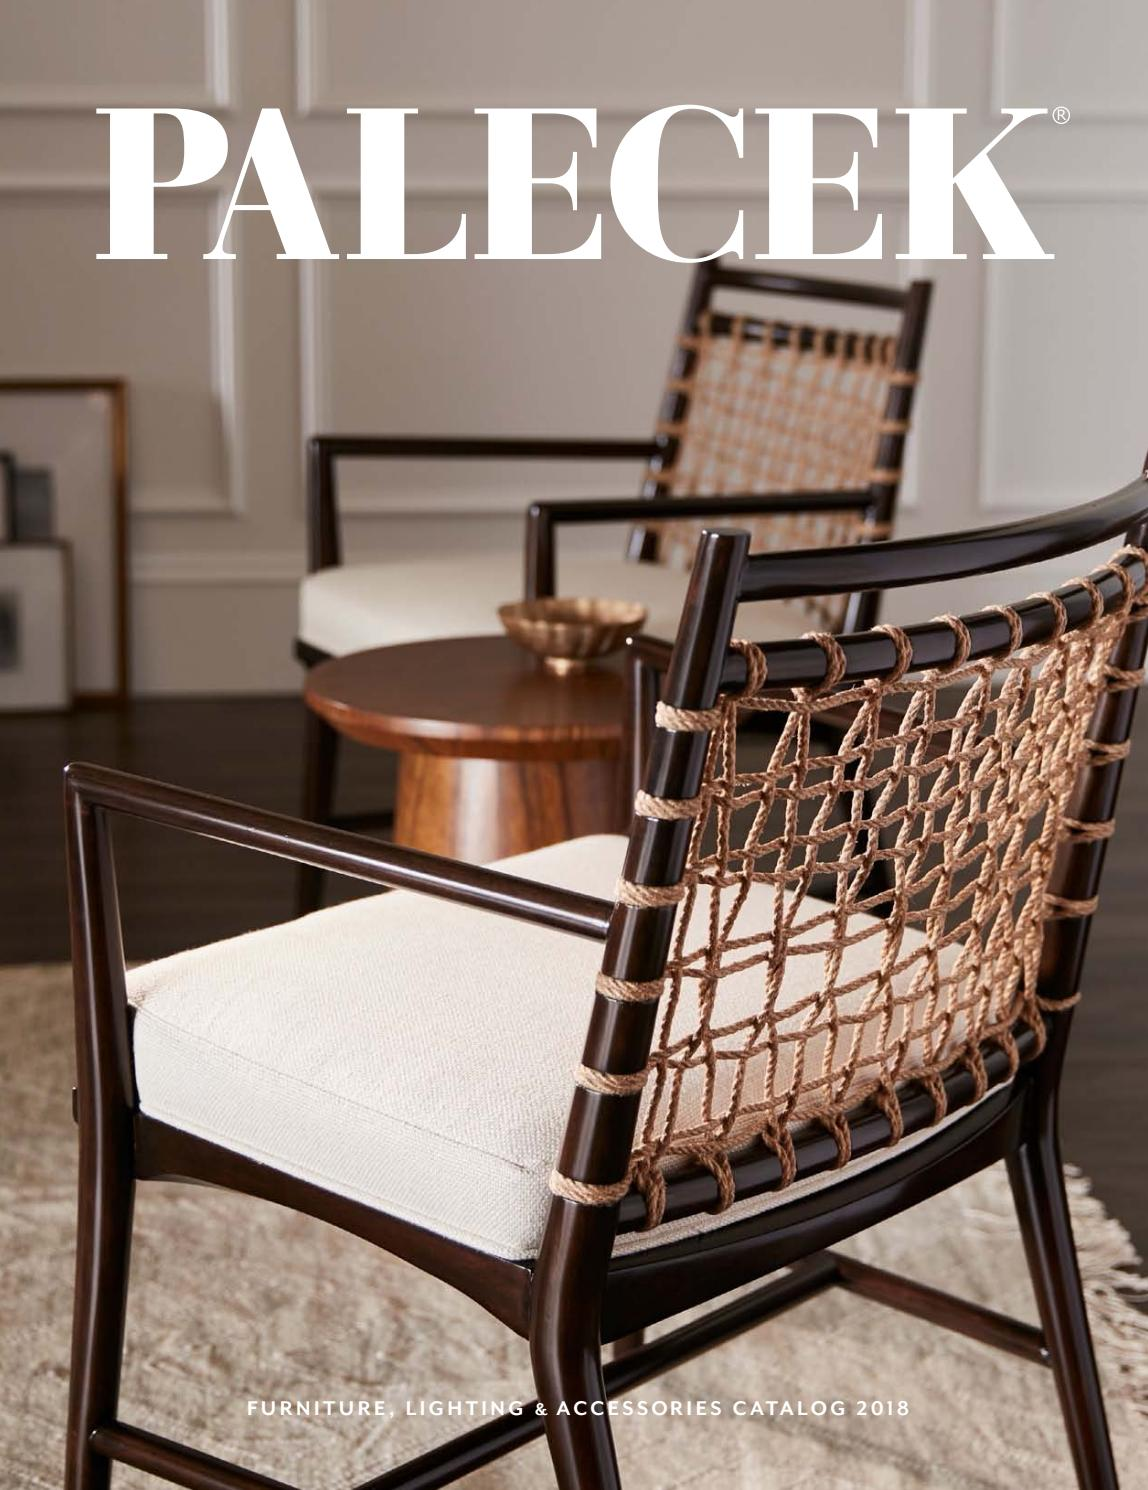 Palecek 2018 Furniture Accessories Catalog By Palecekdesign Issuu